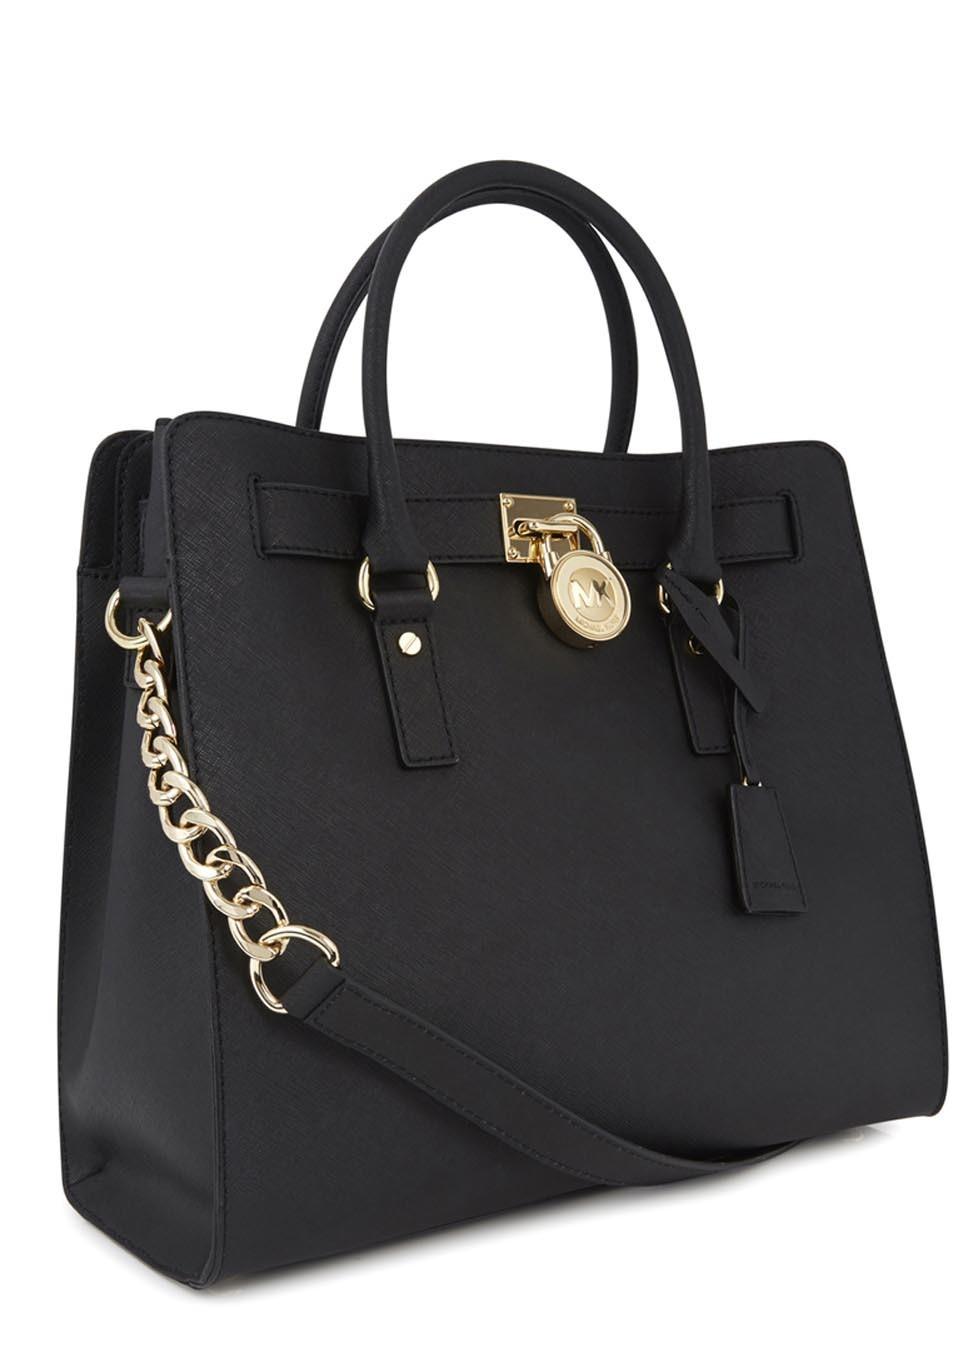 904bb7d4ea94 Black Saffiano Leather Bag Michael Kors | Stanford Center for ...